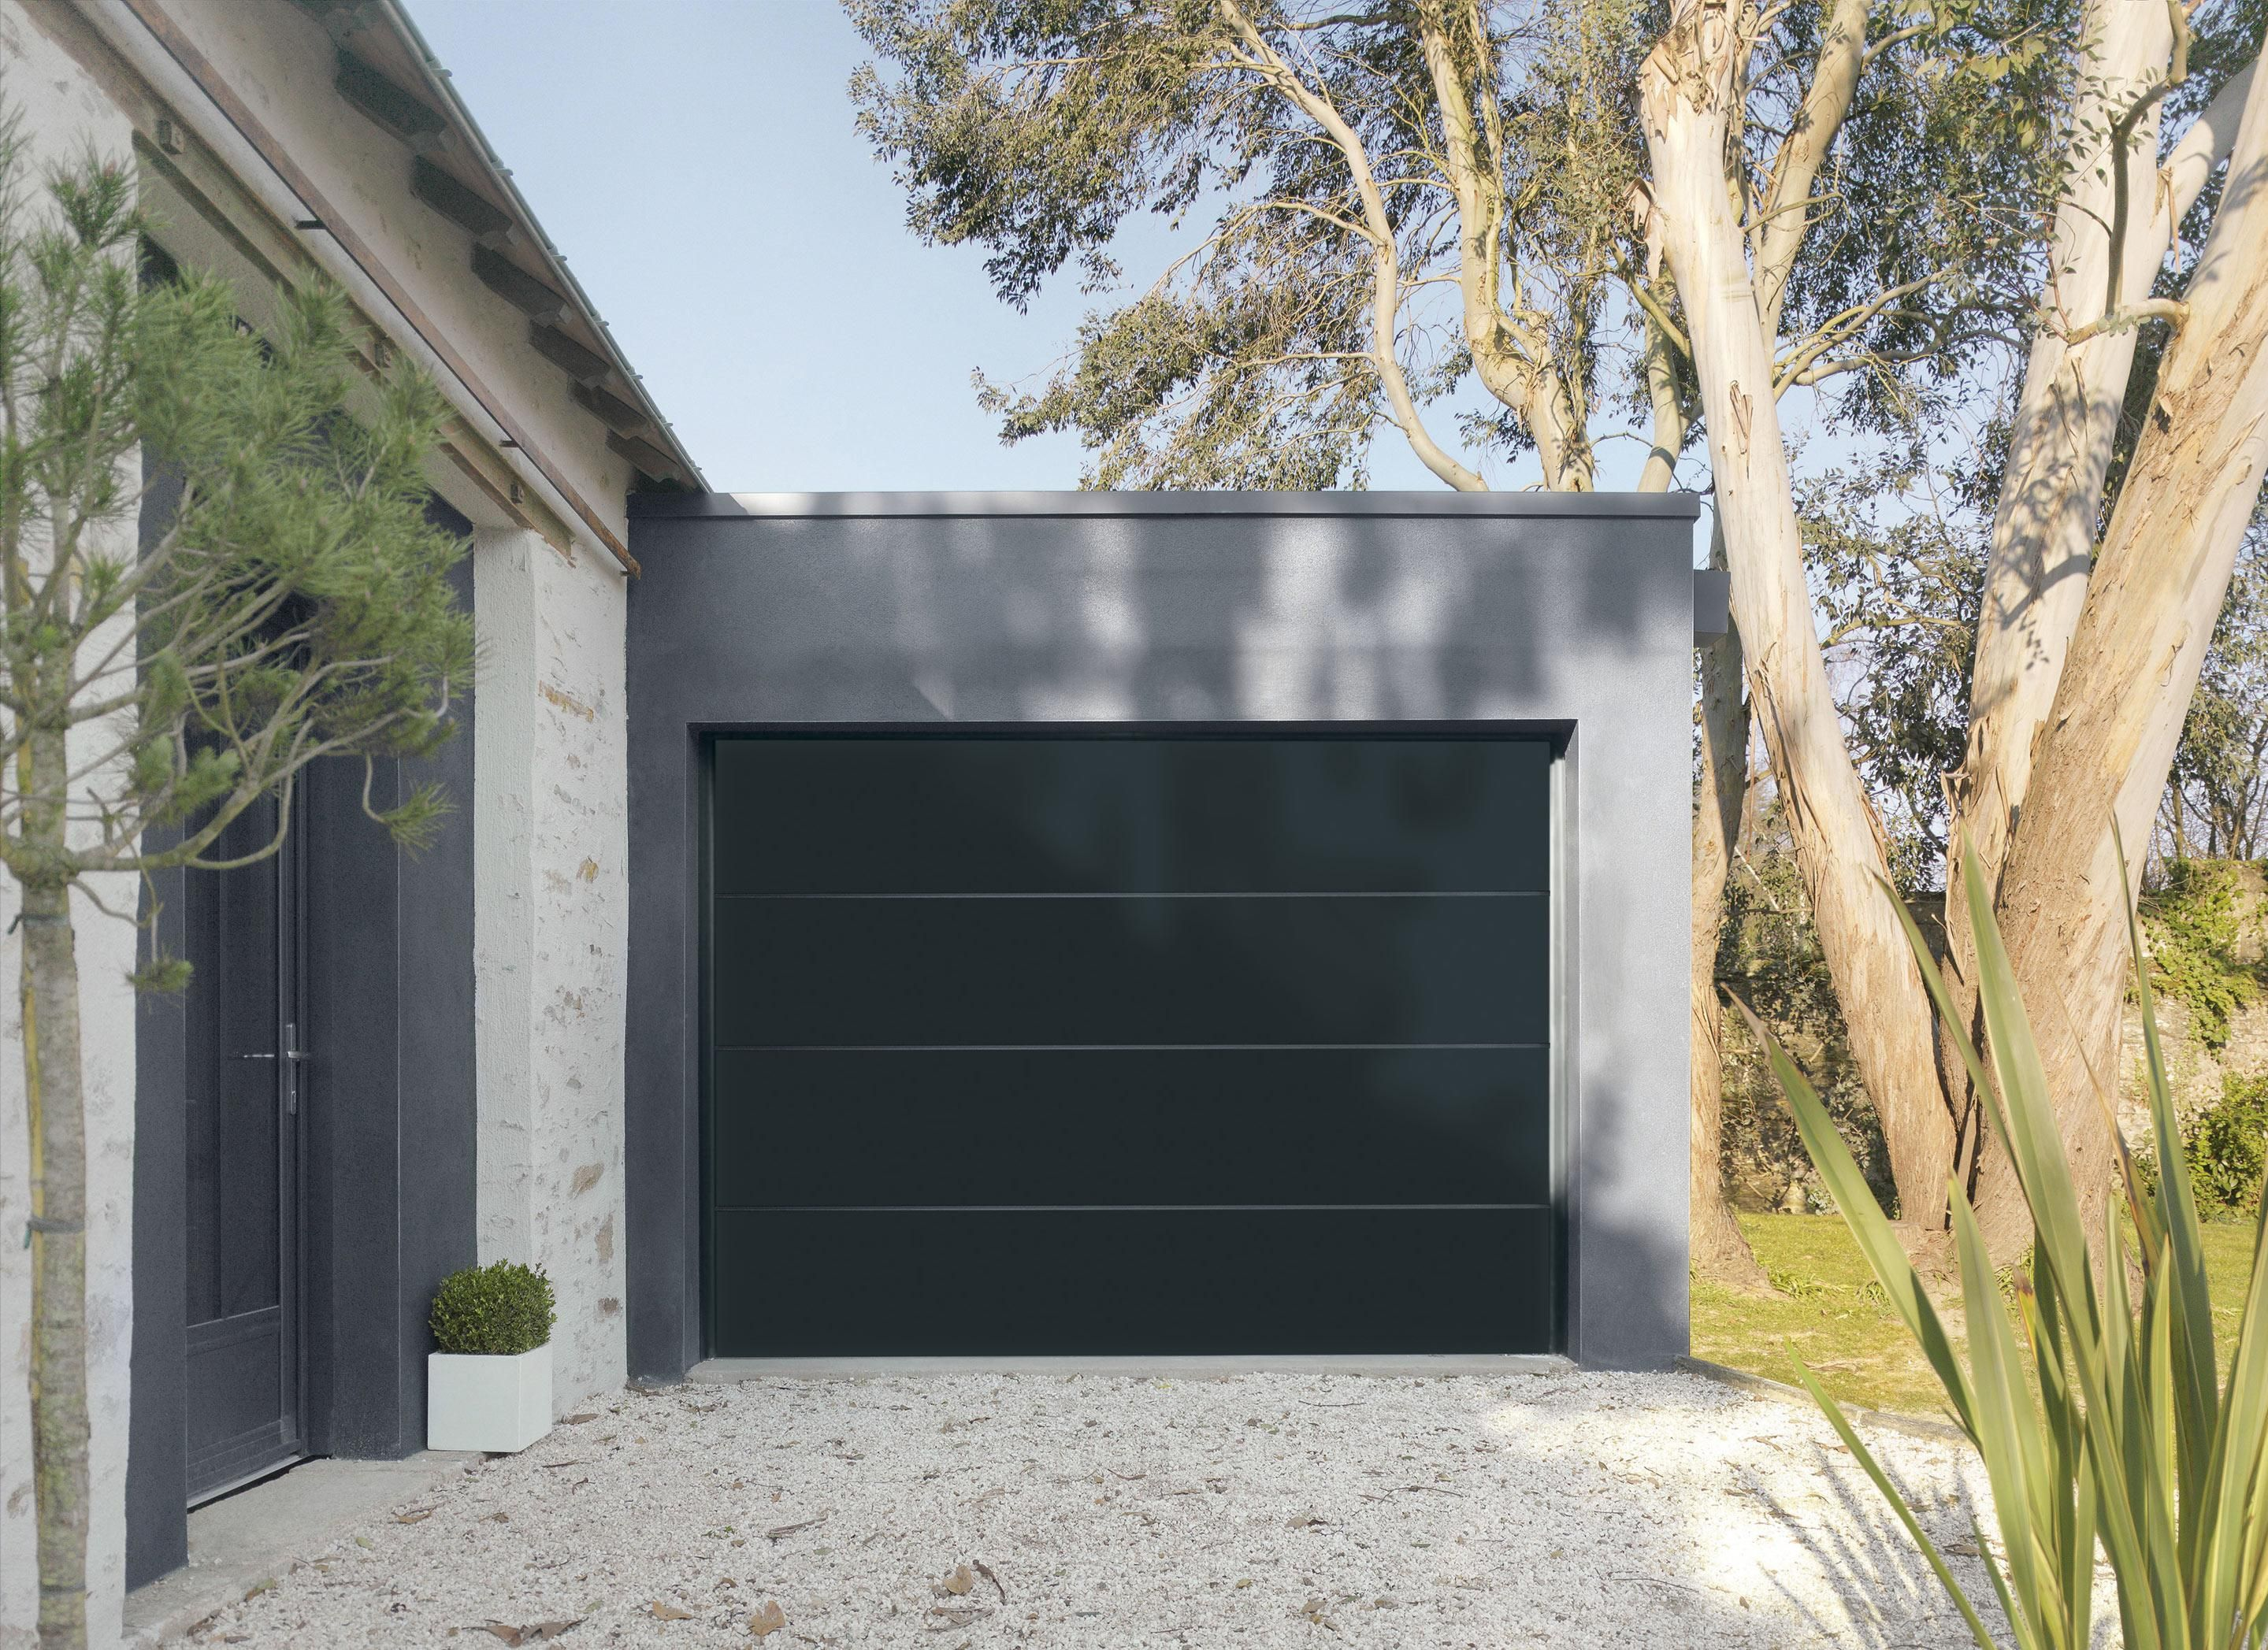 Porte De Garage Sectionnelle Motorisee Artens Premium 212 5x300 Noir Porte De Garage Sectionnelle Porte Garage Et Garage